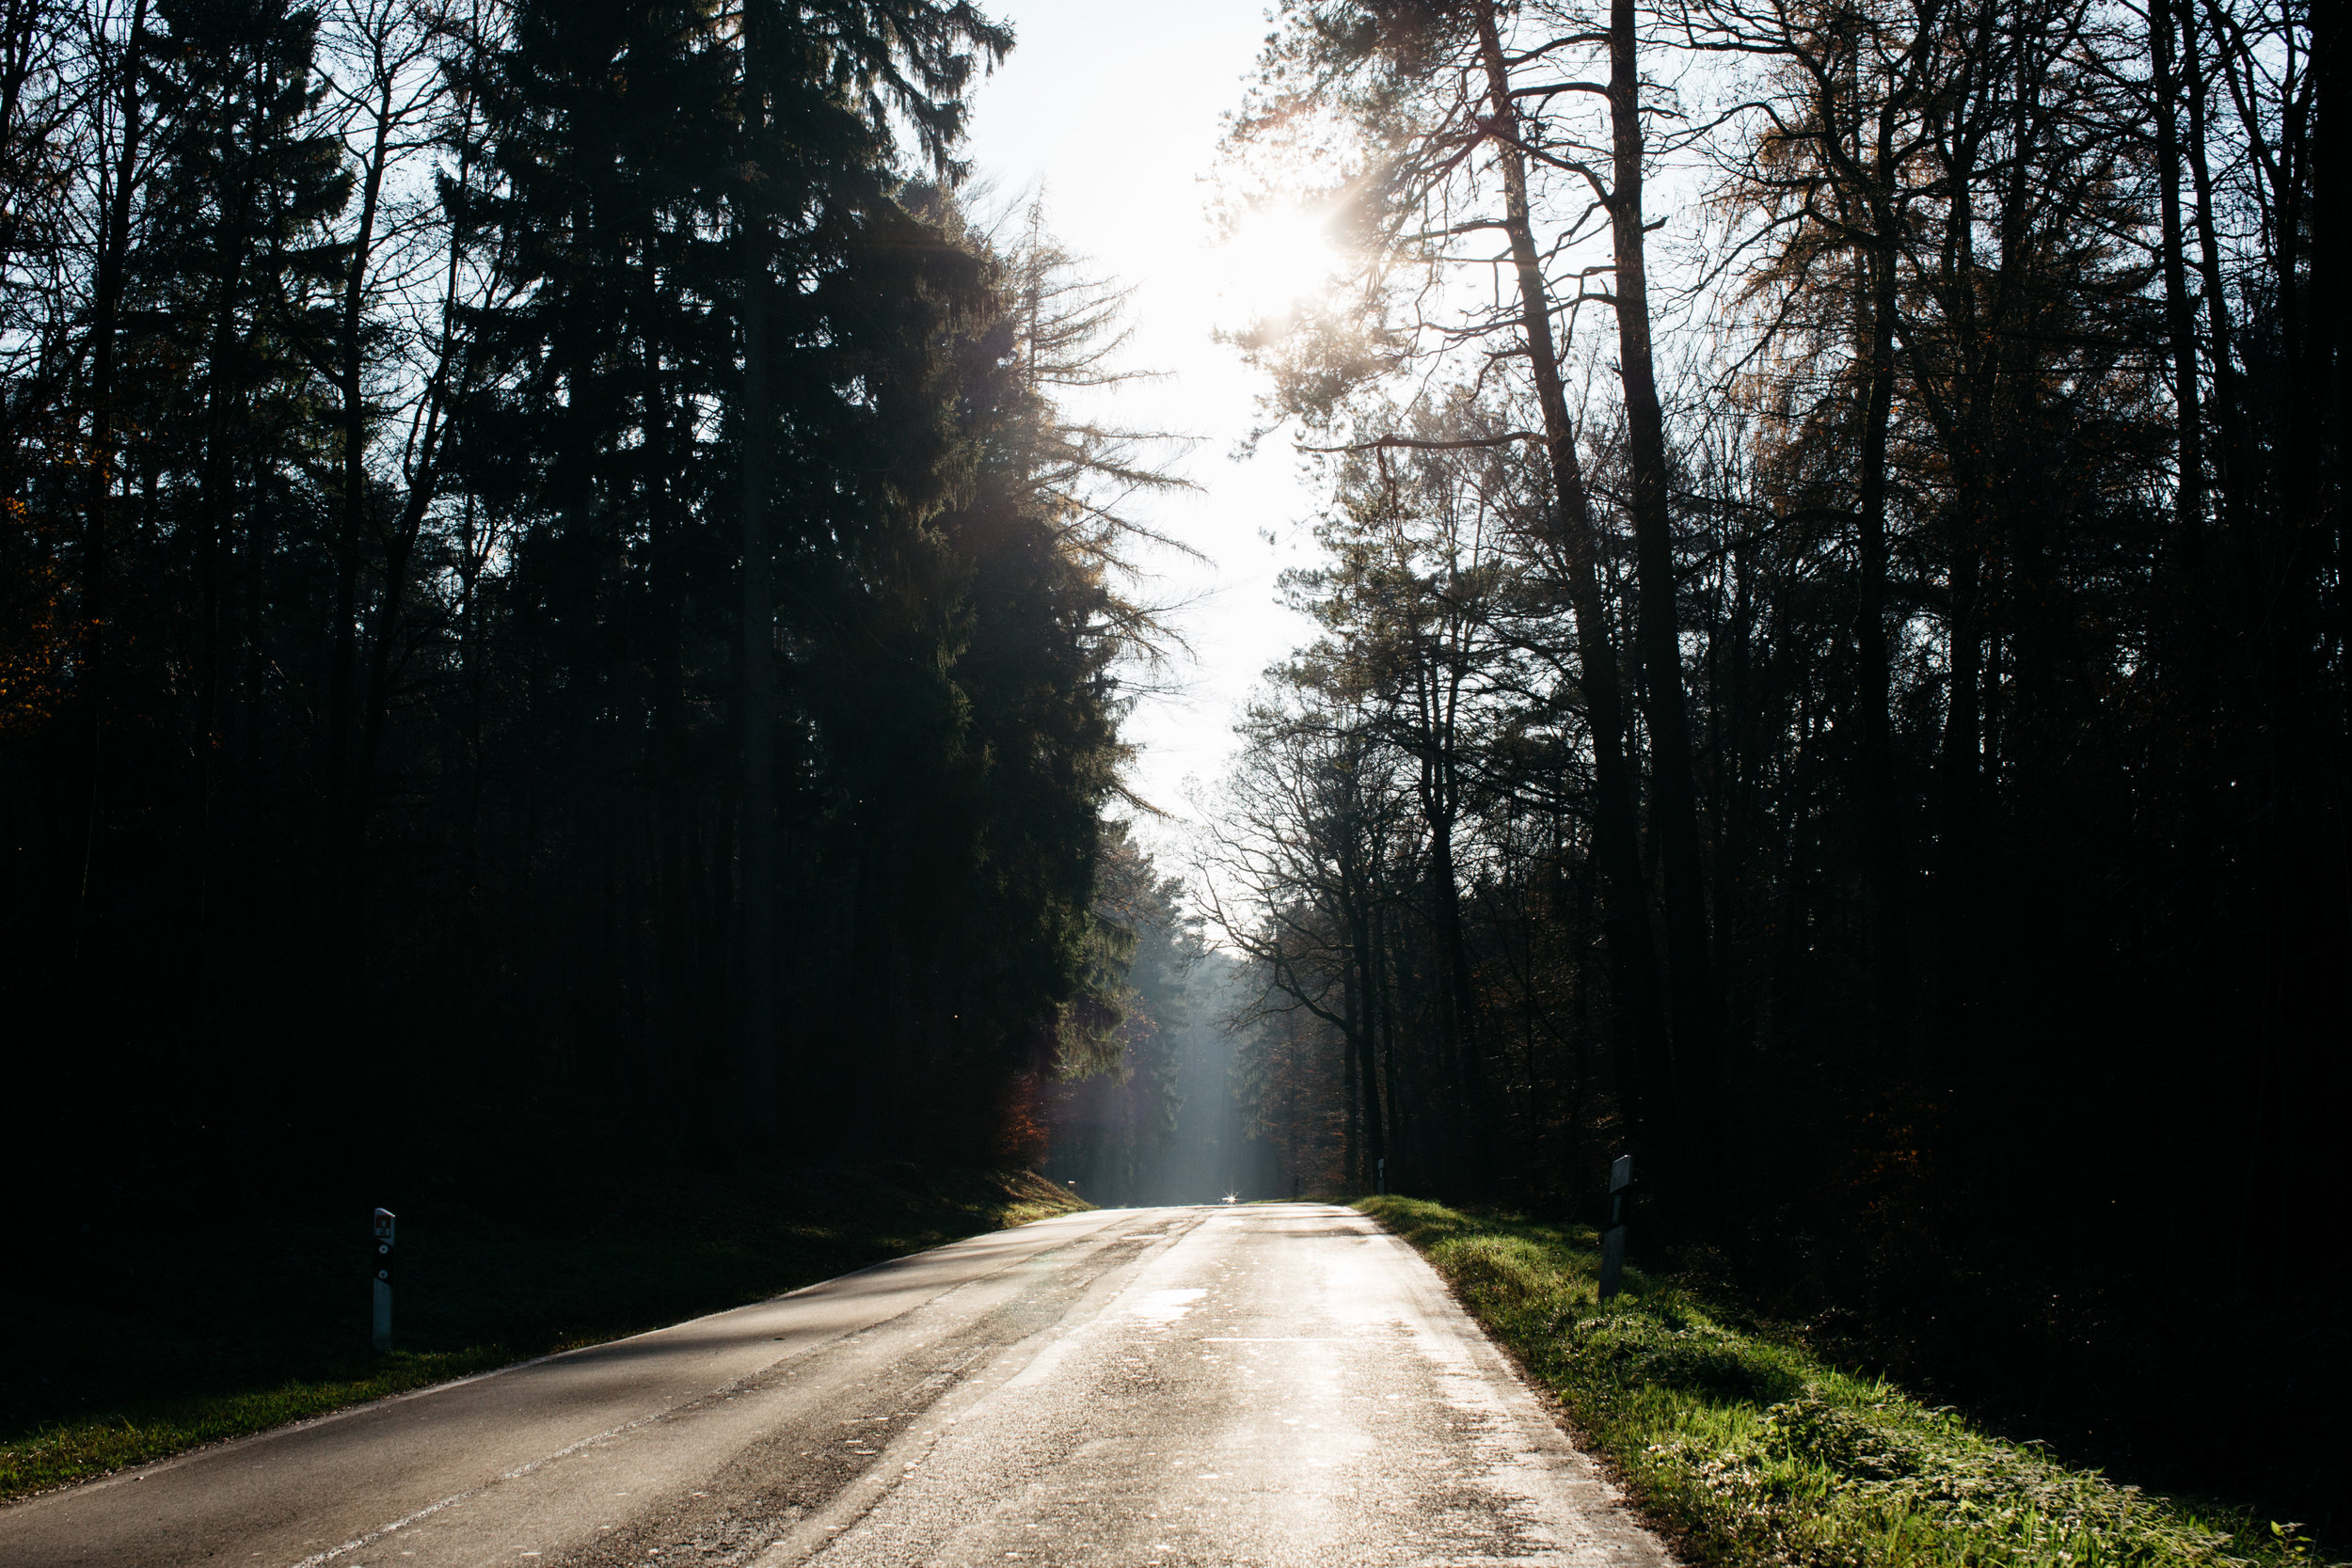 autobahn-germany-fortitude-and-finn.jpg